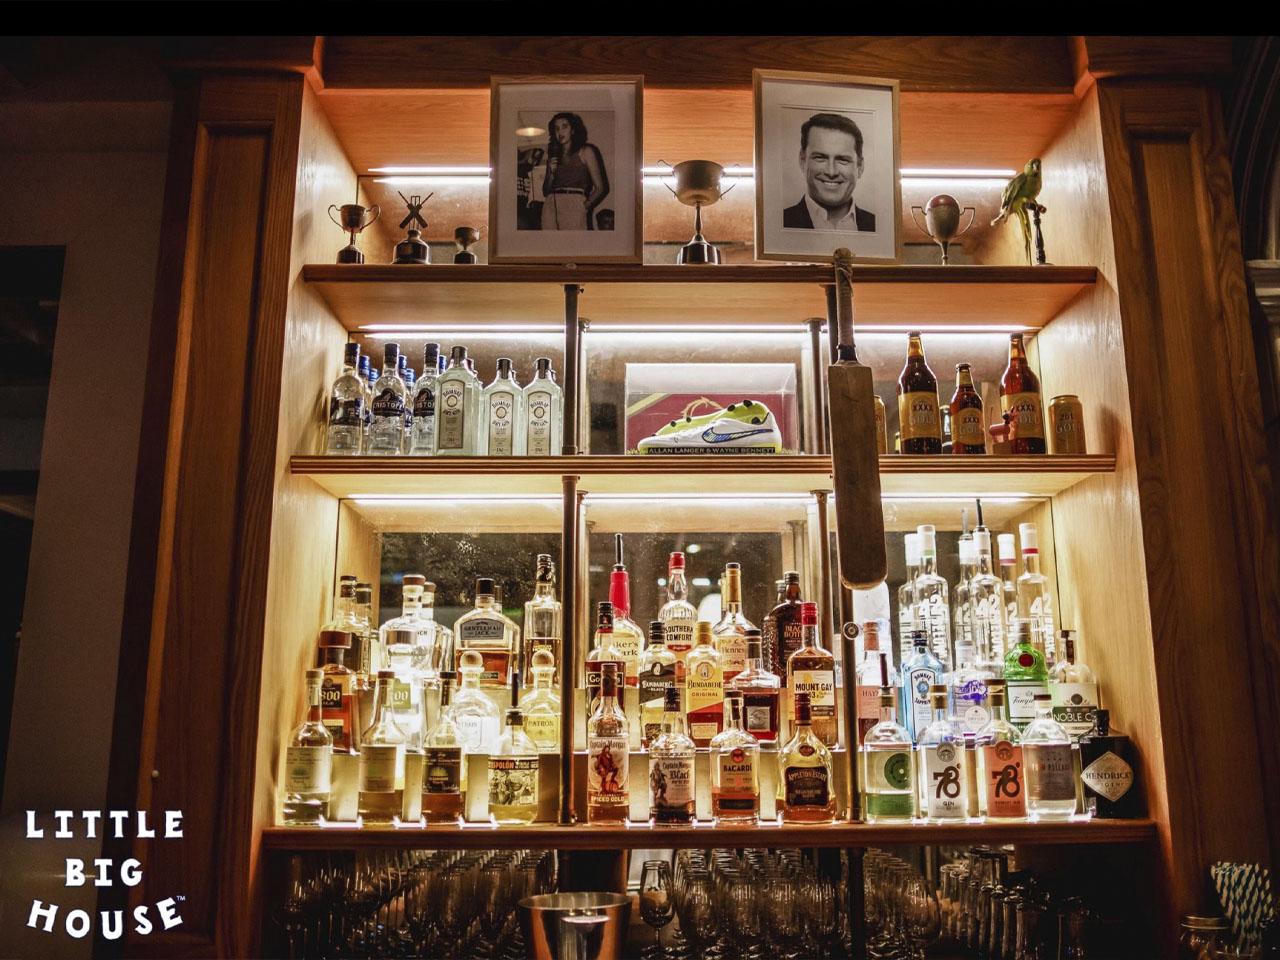 Drinks cabinet showing full selection of bottles spirits